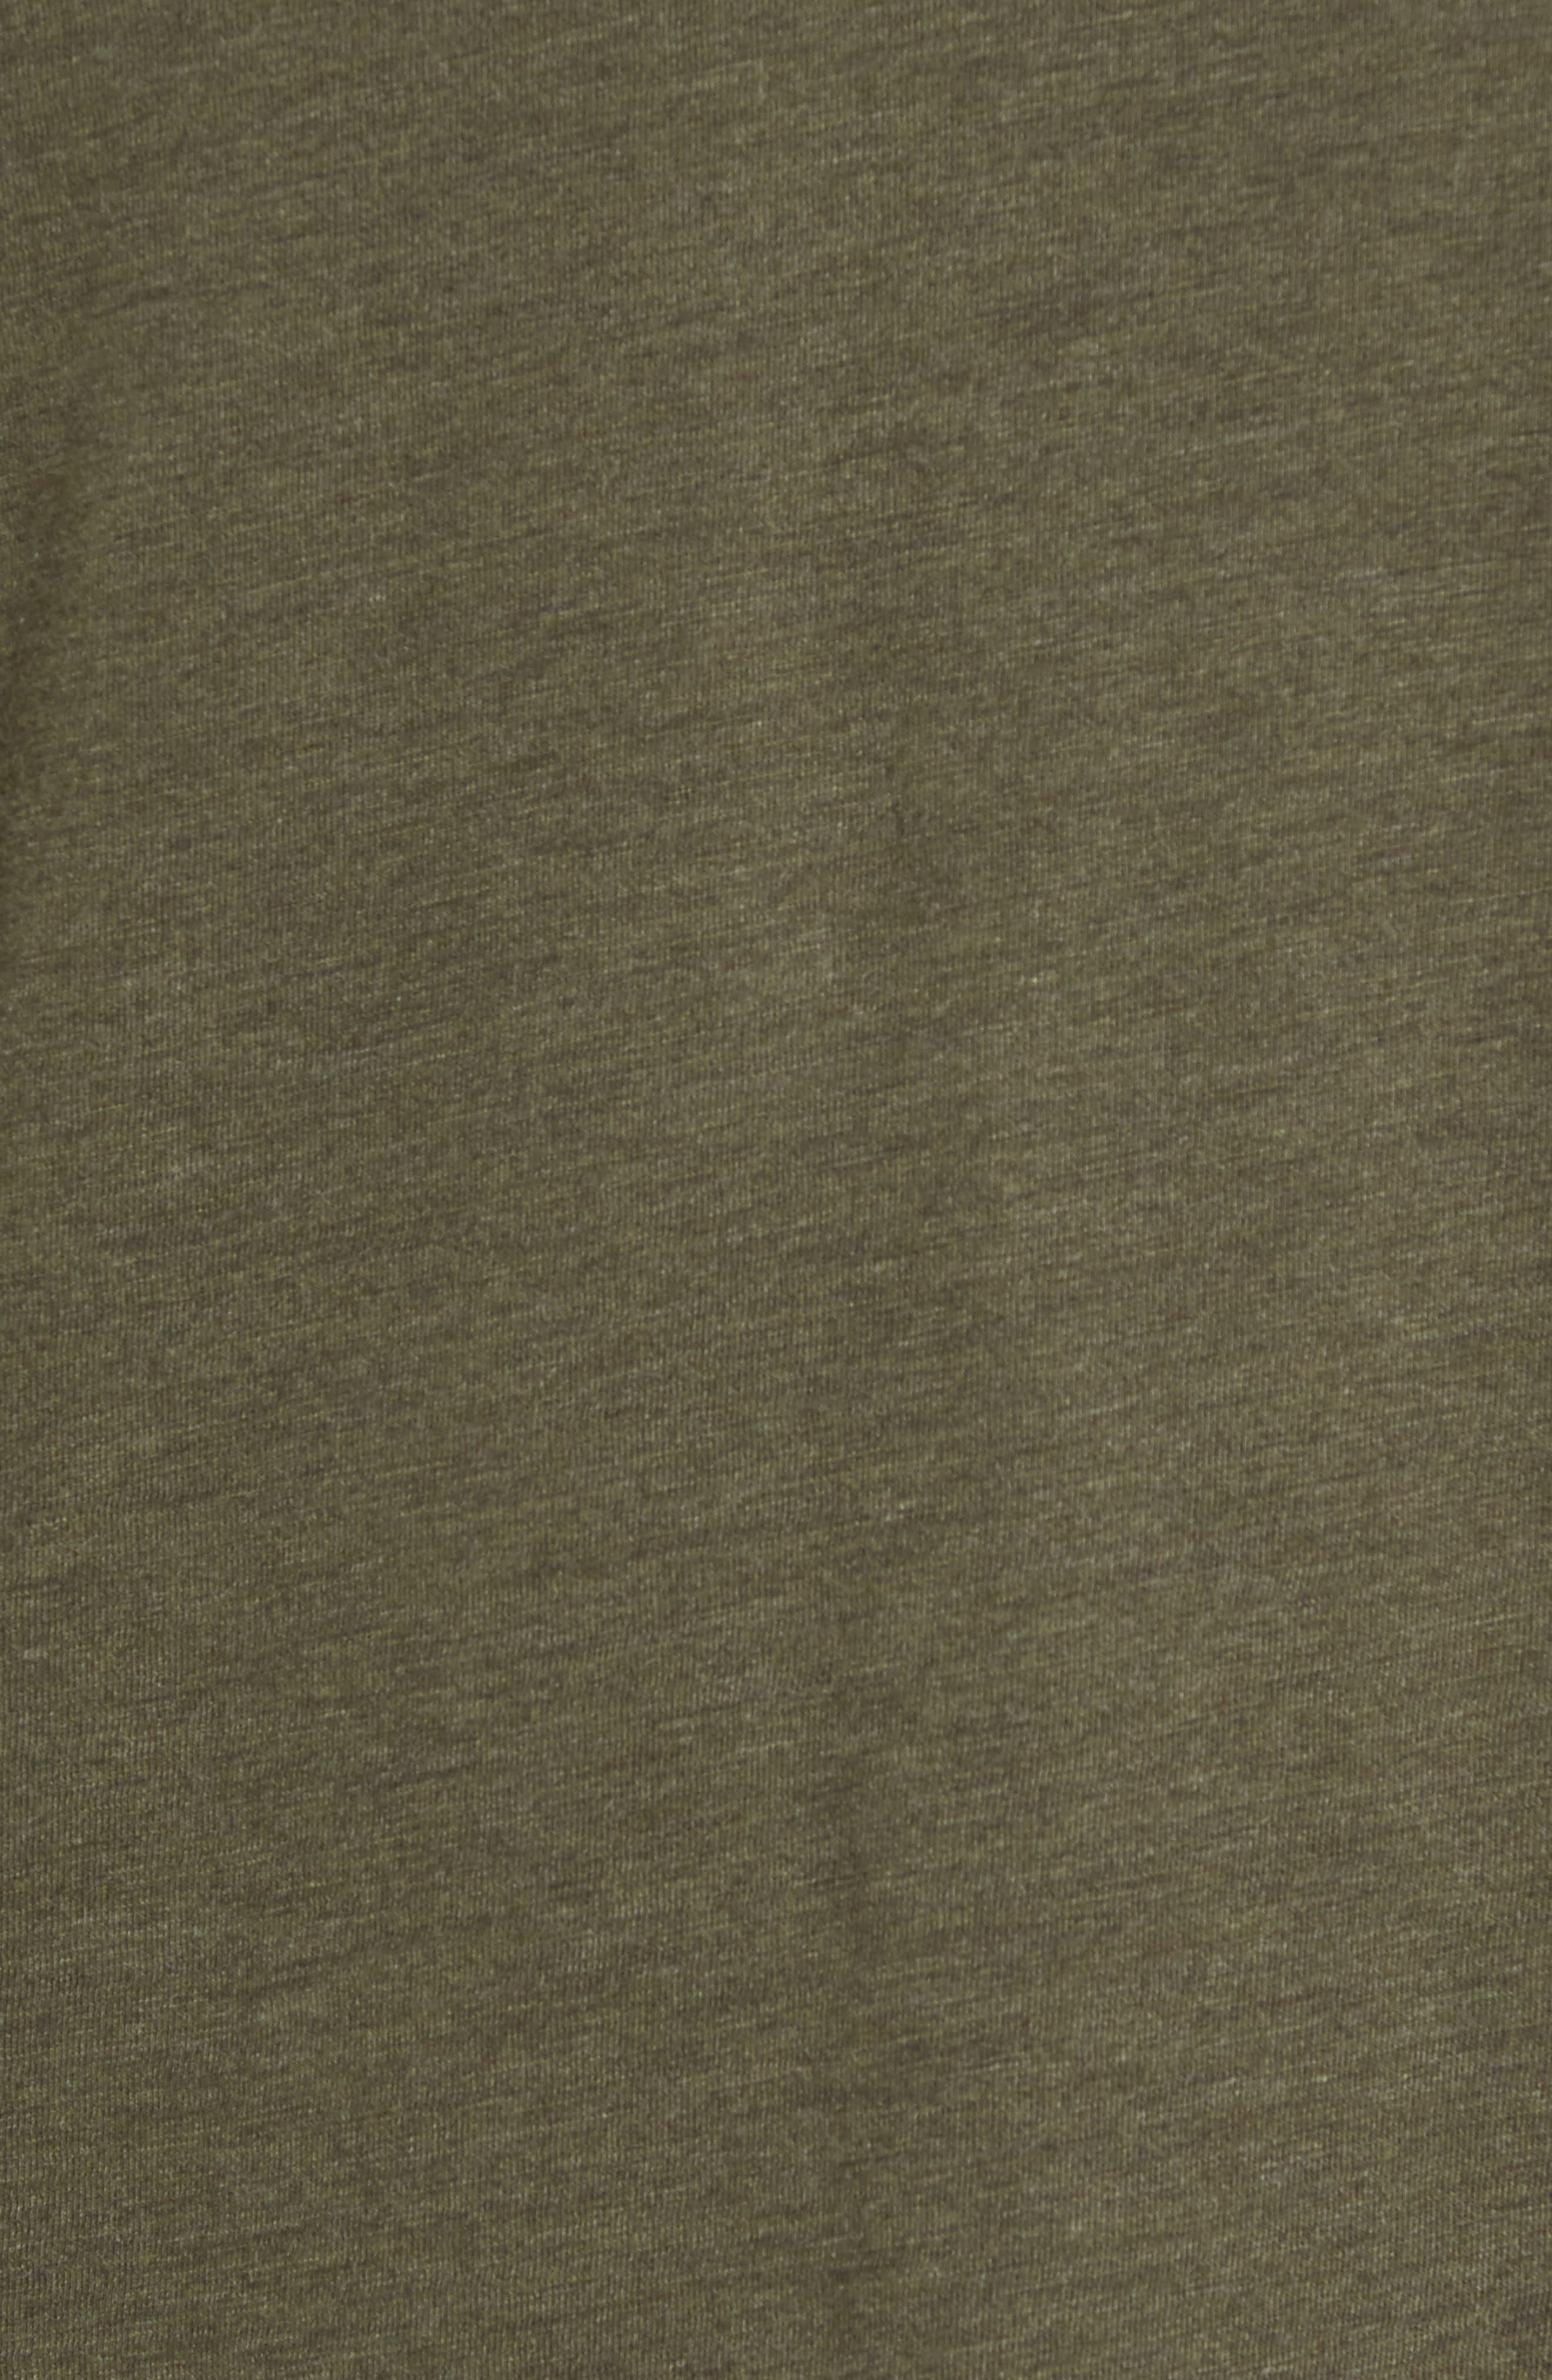 Bing Short Sleeve Henley Shirt,                             Alternate thumbnail 5, color,                             306